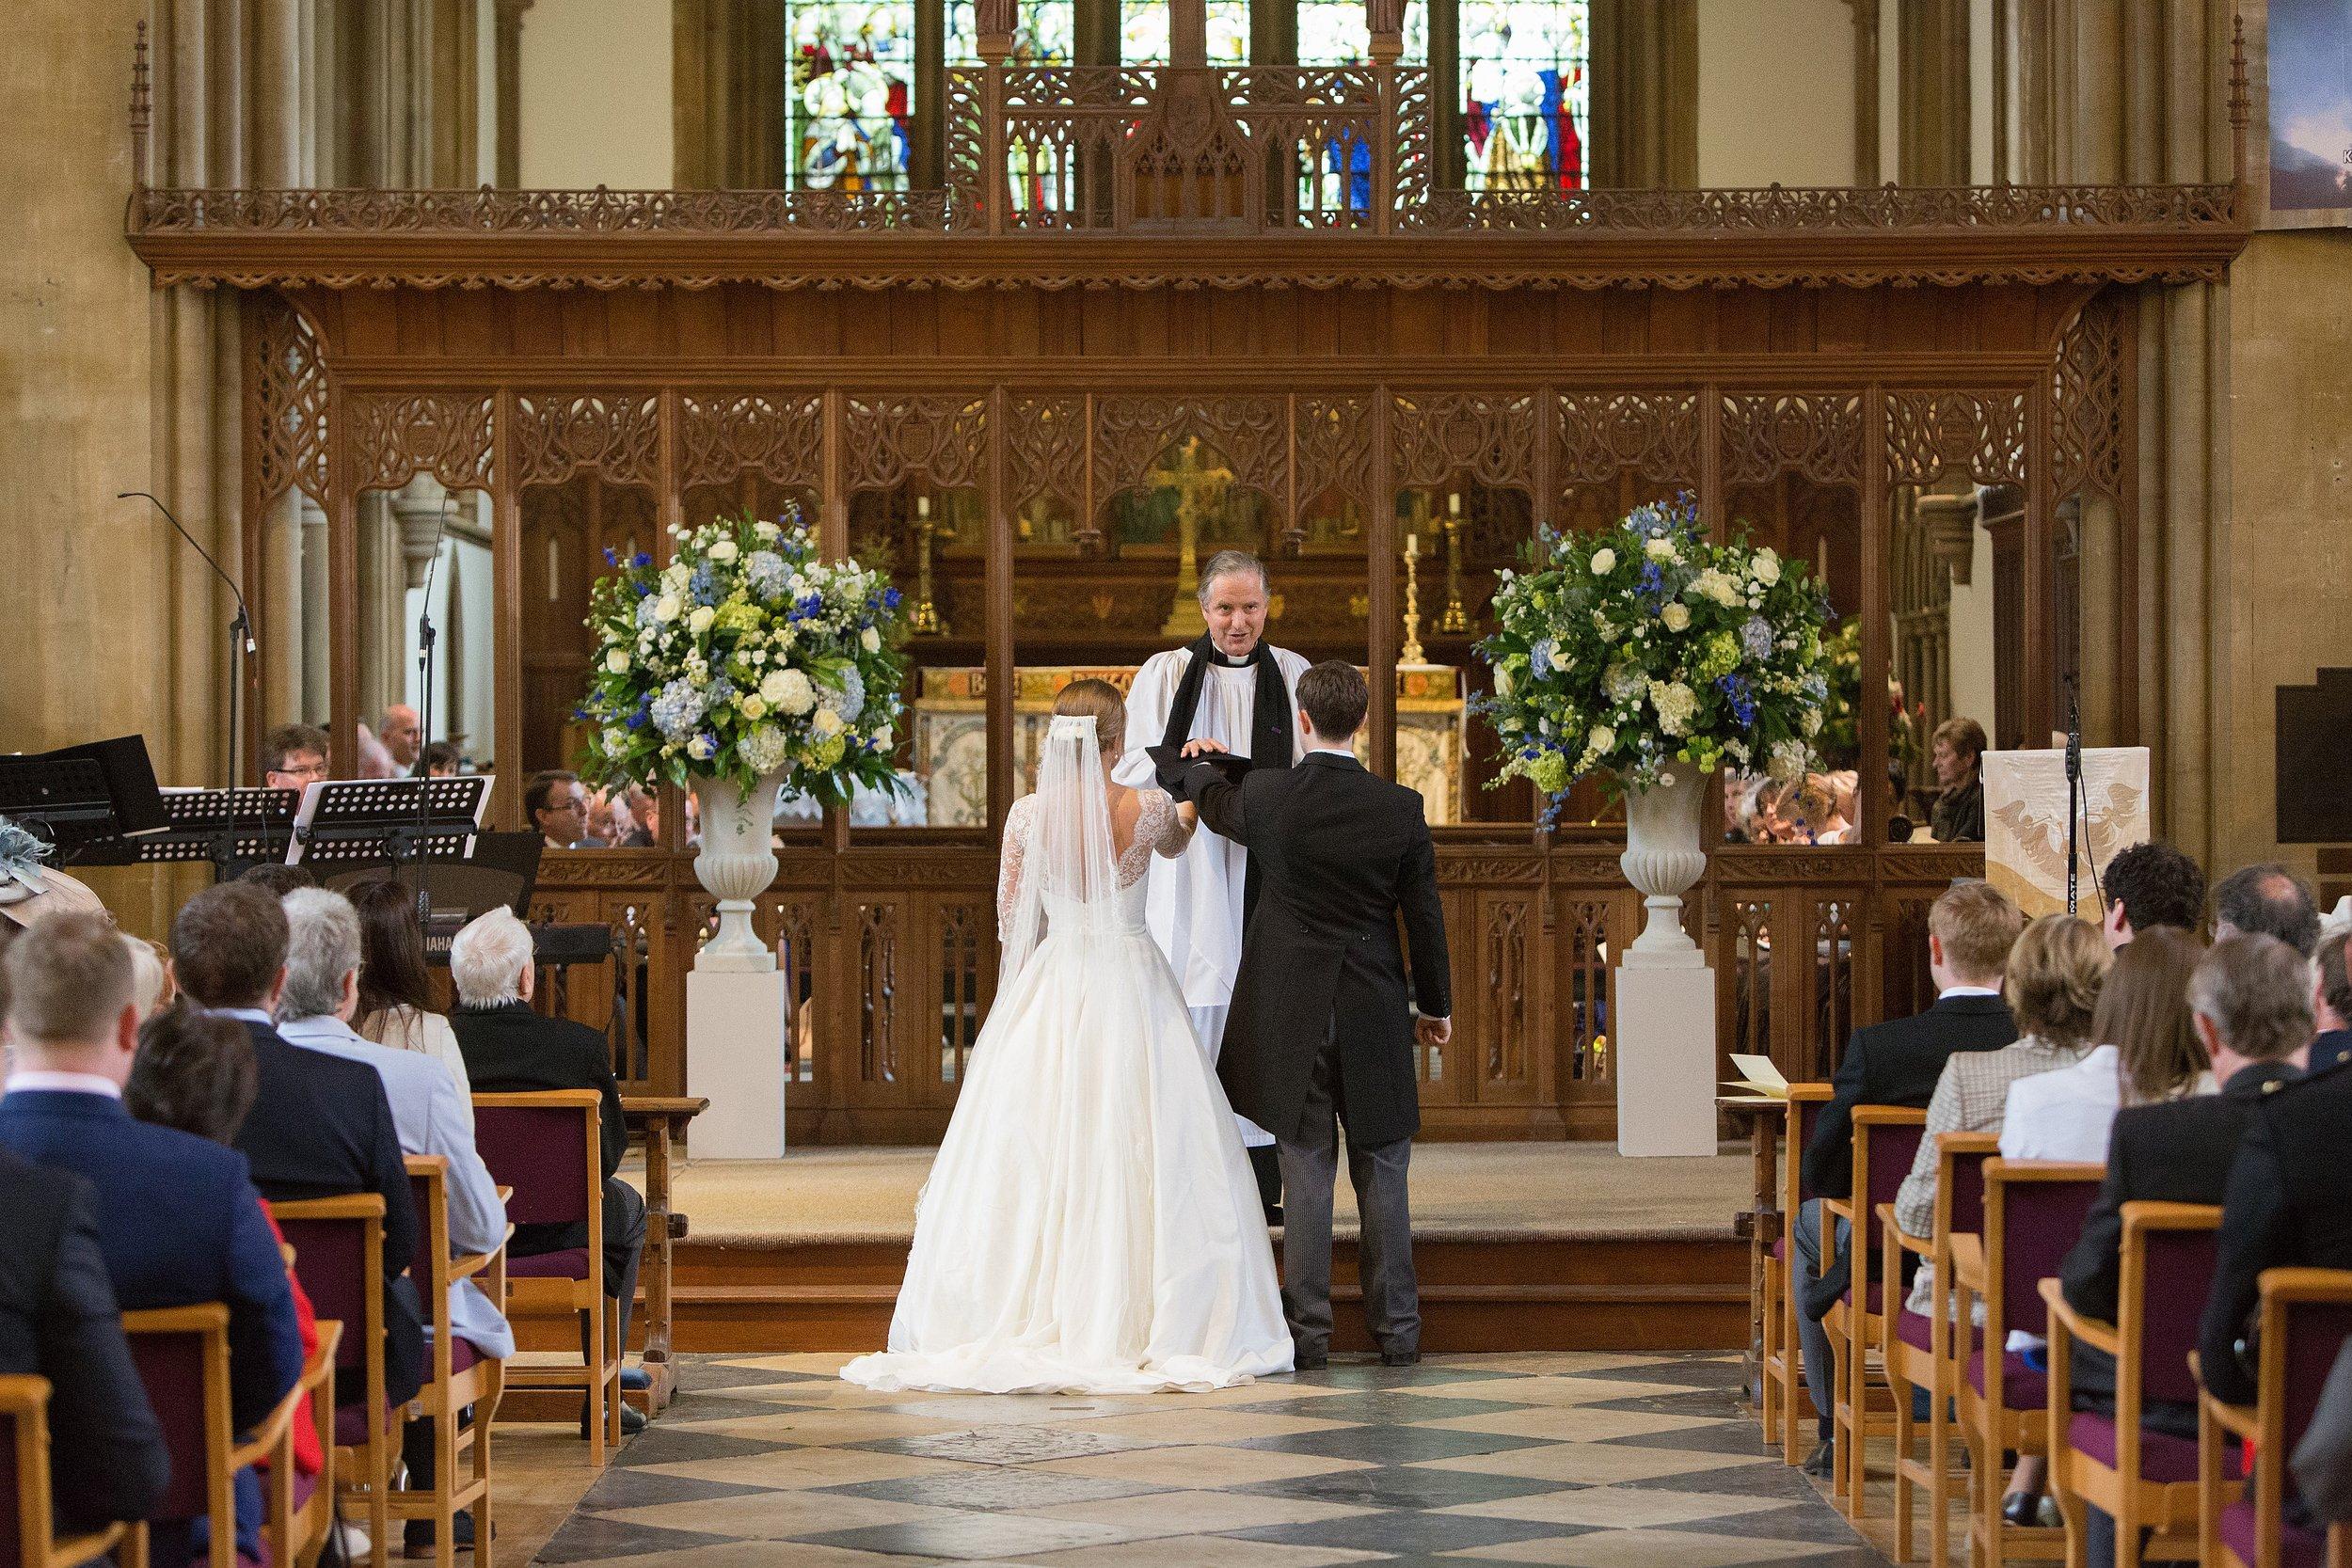 MIRIAM_FAITH_WEDDING_FLOWERS_CEREMONY_URN_CHURCH_PEDESTAL_BLUE_WHITE_GREEN_VOW.JPG